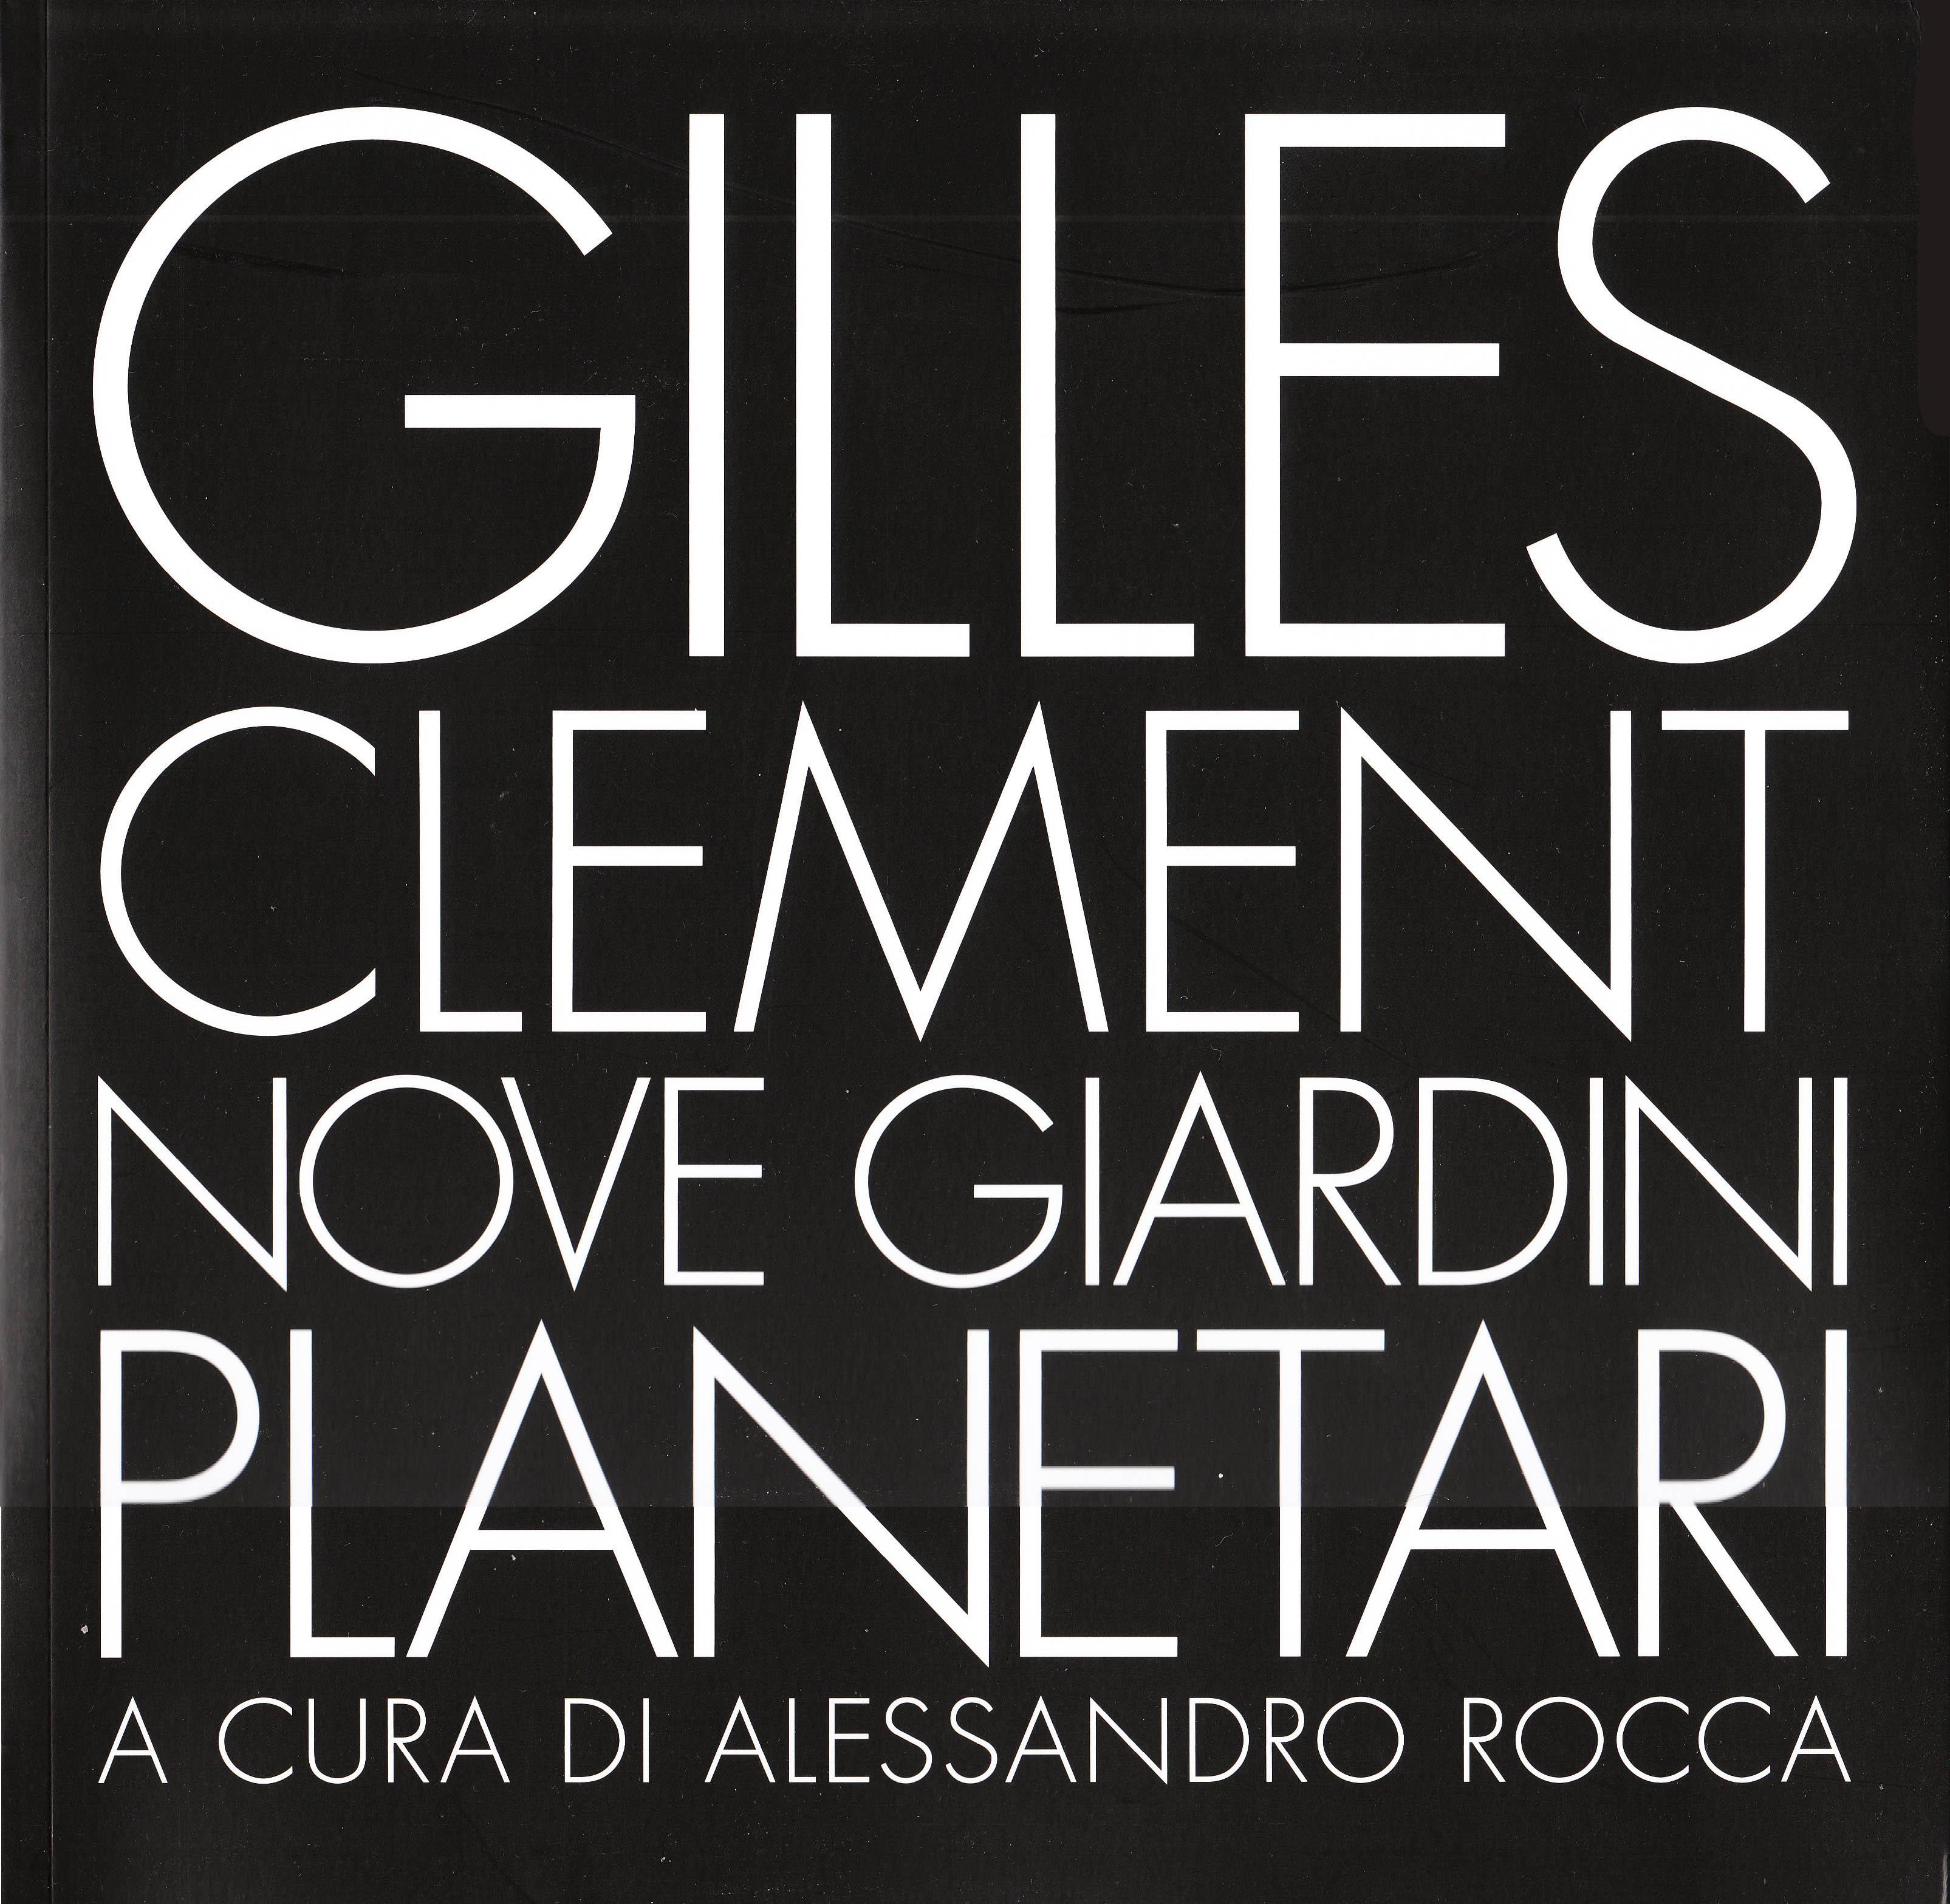 Nove giardini planet...